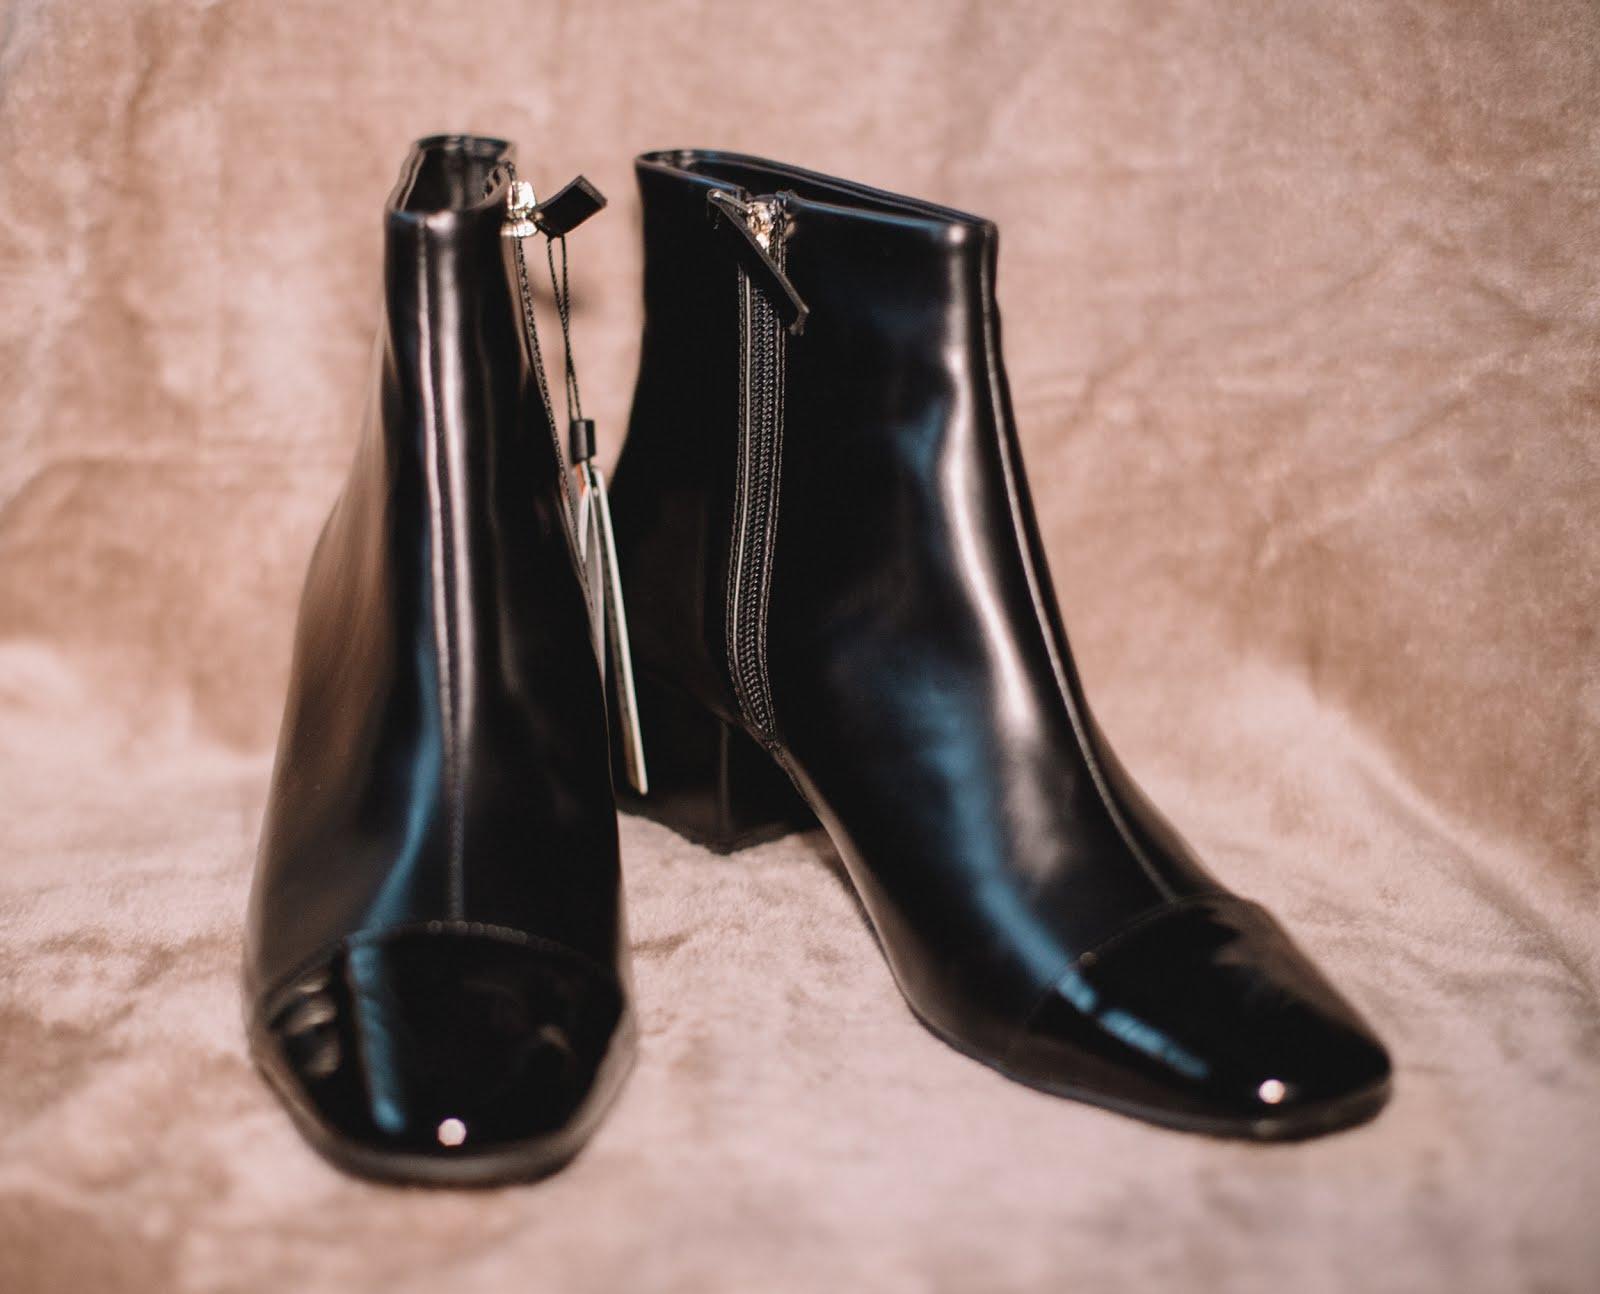 zara botins ankle boots pretos black saldos sales the paper and ink